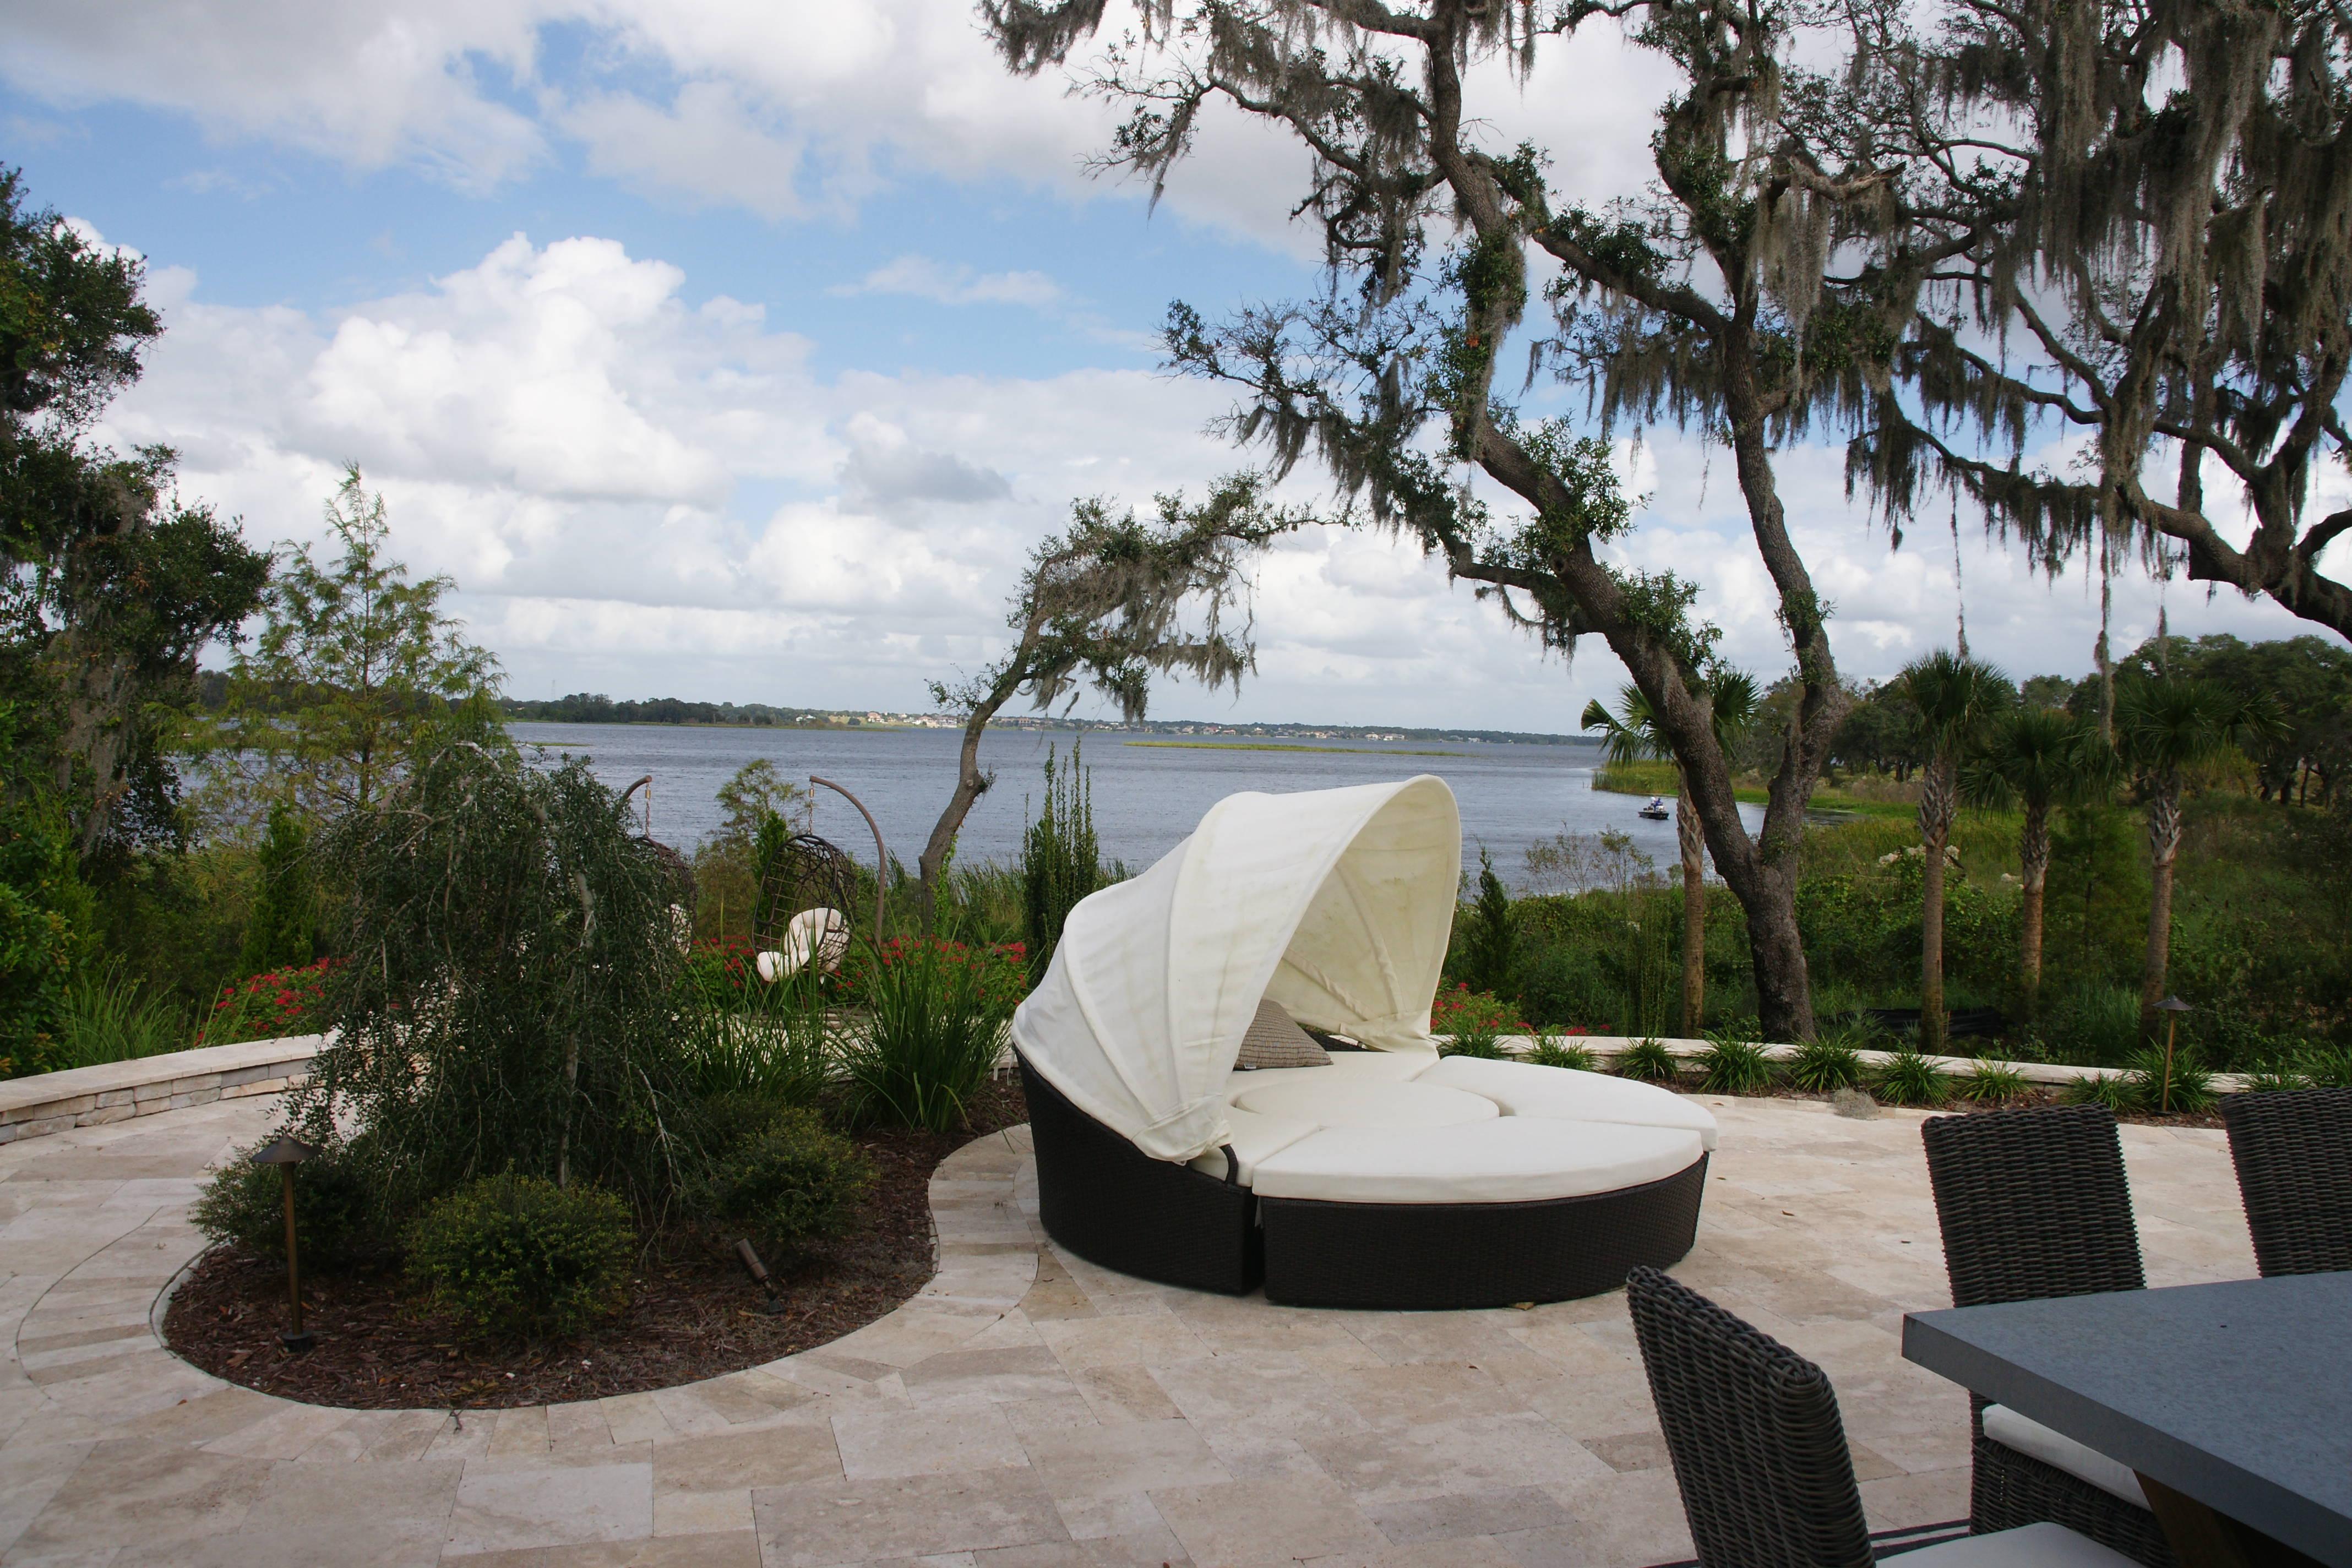 Waterside Community Winter Garden Real Estate